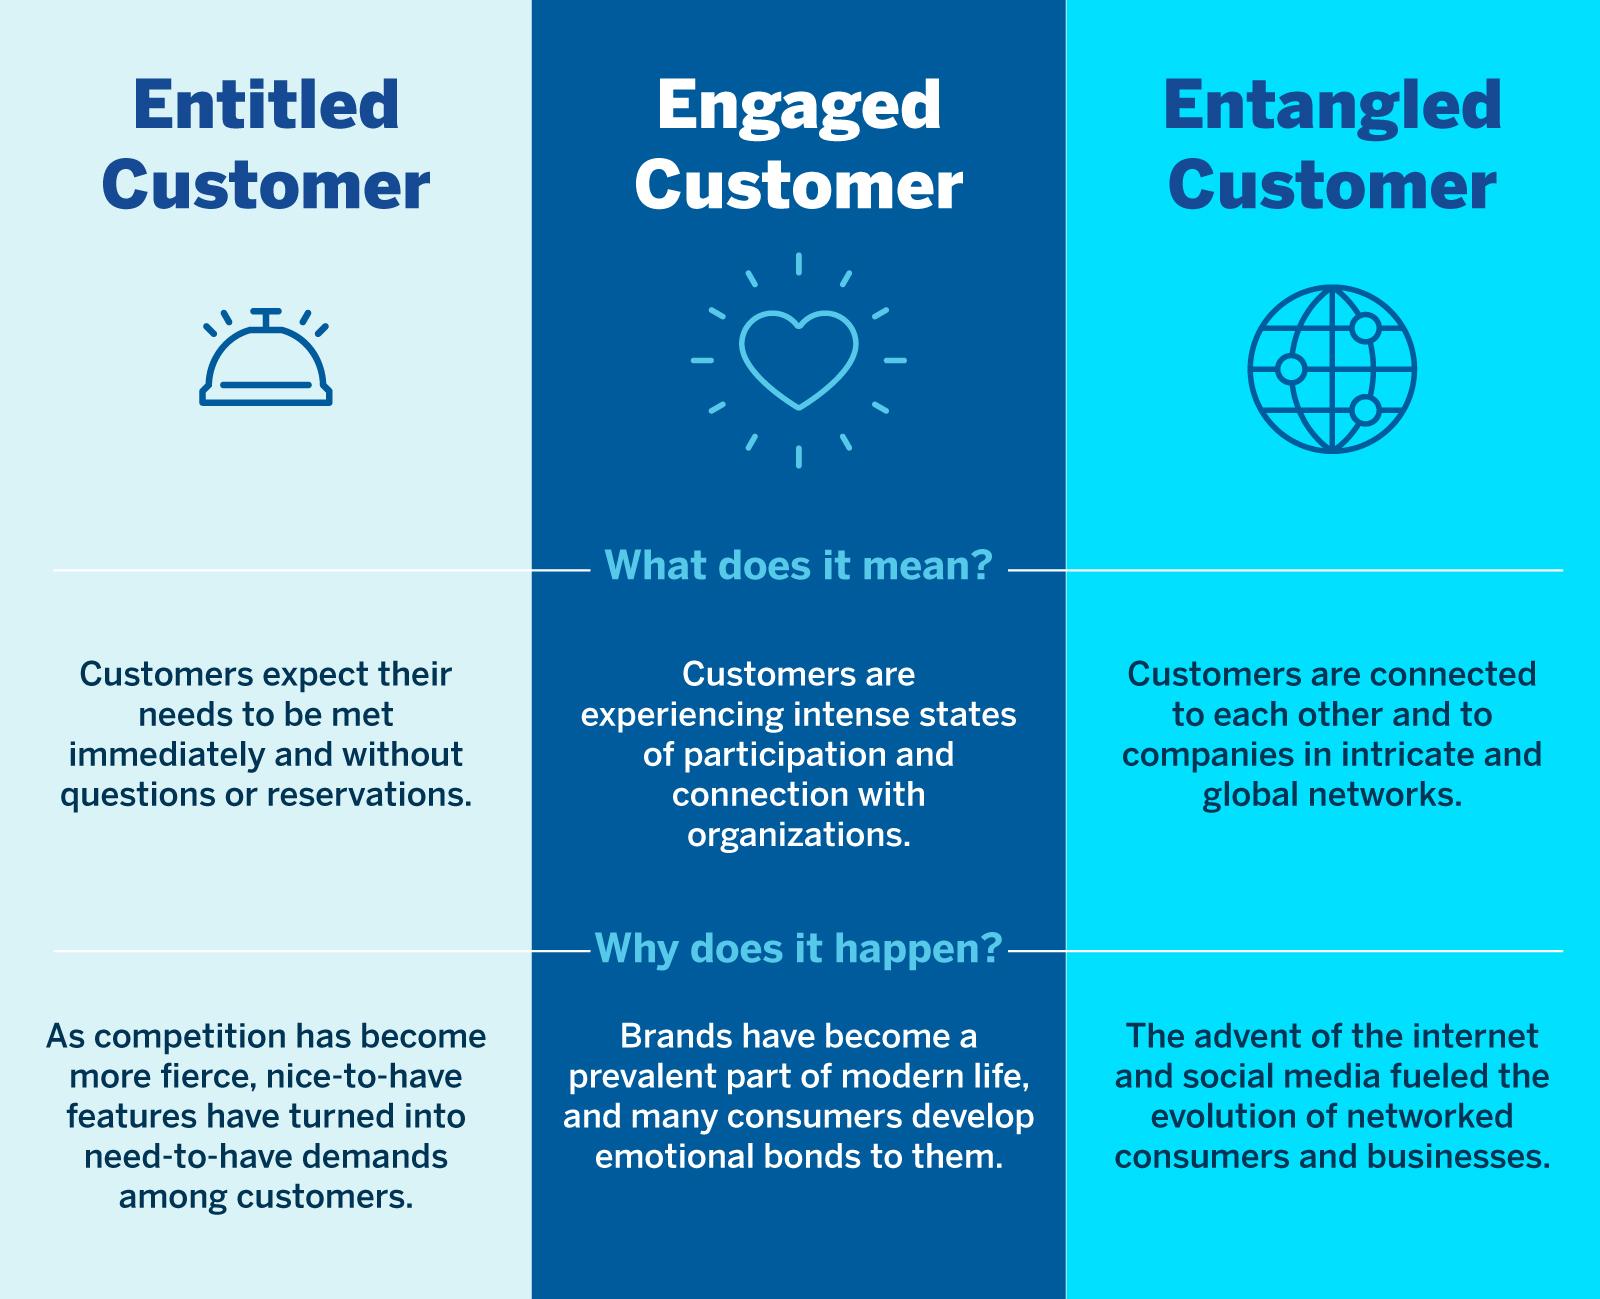 Three Dimensions of Customer Behavior